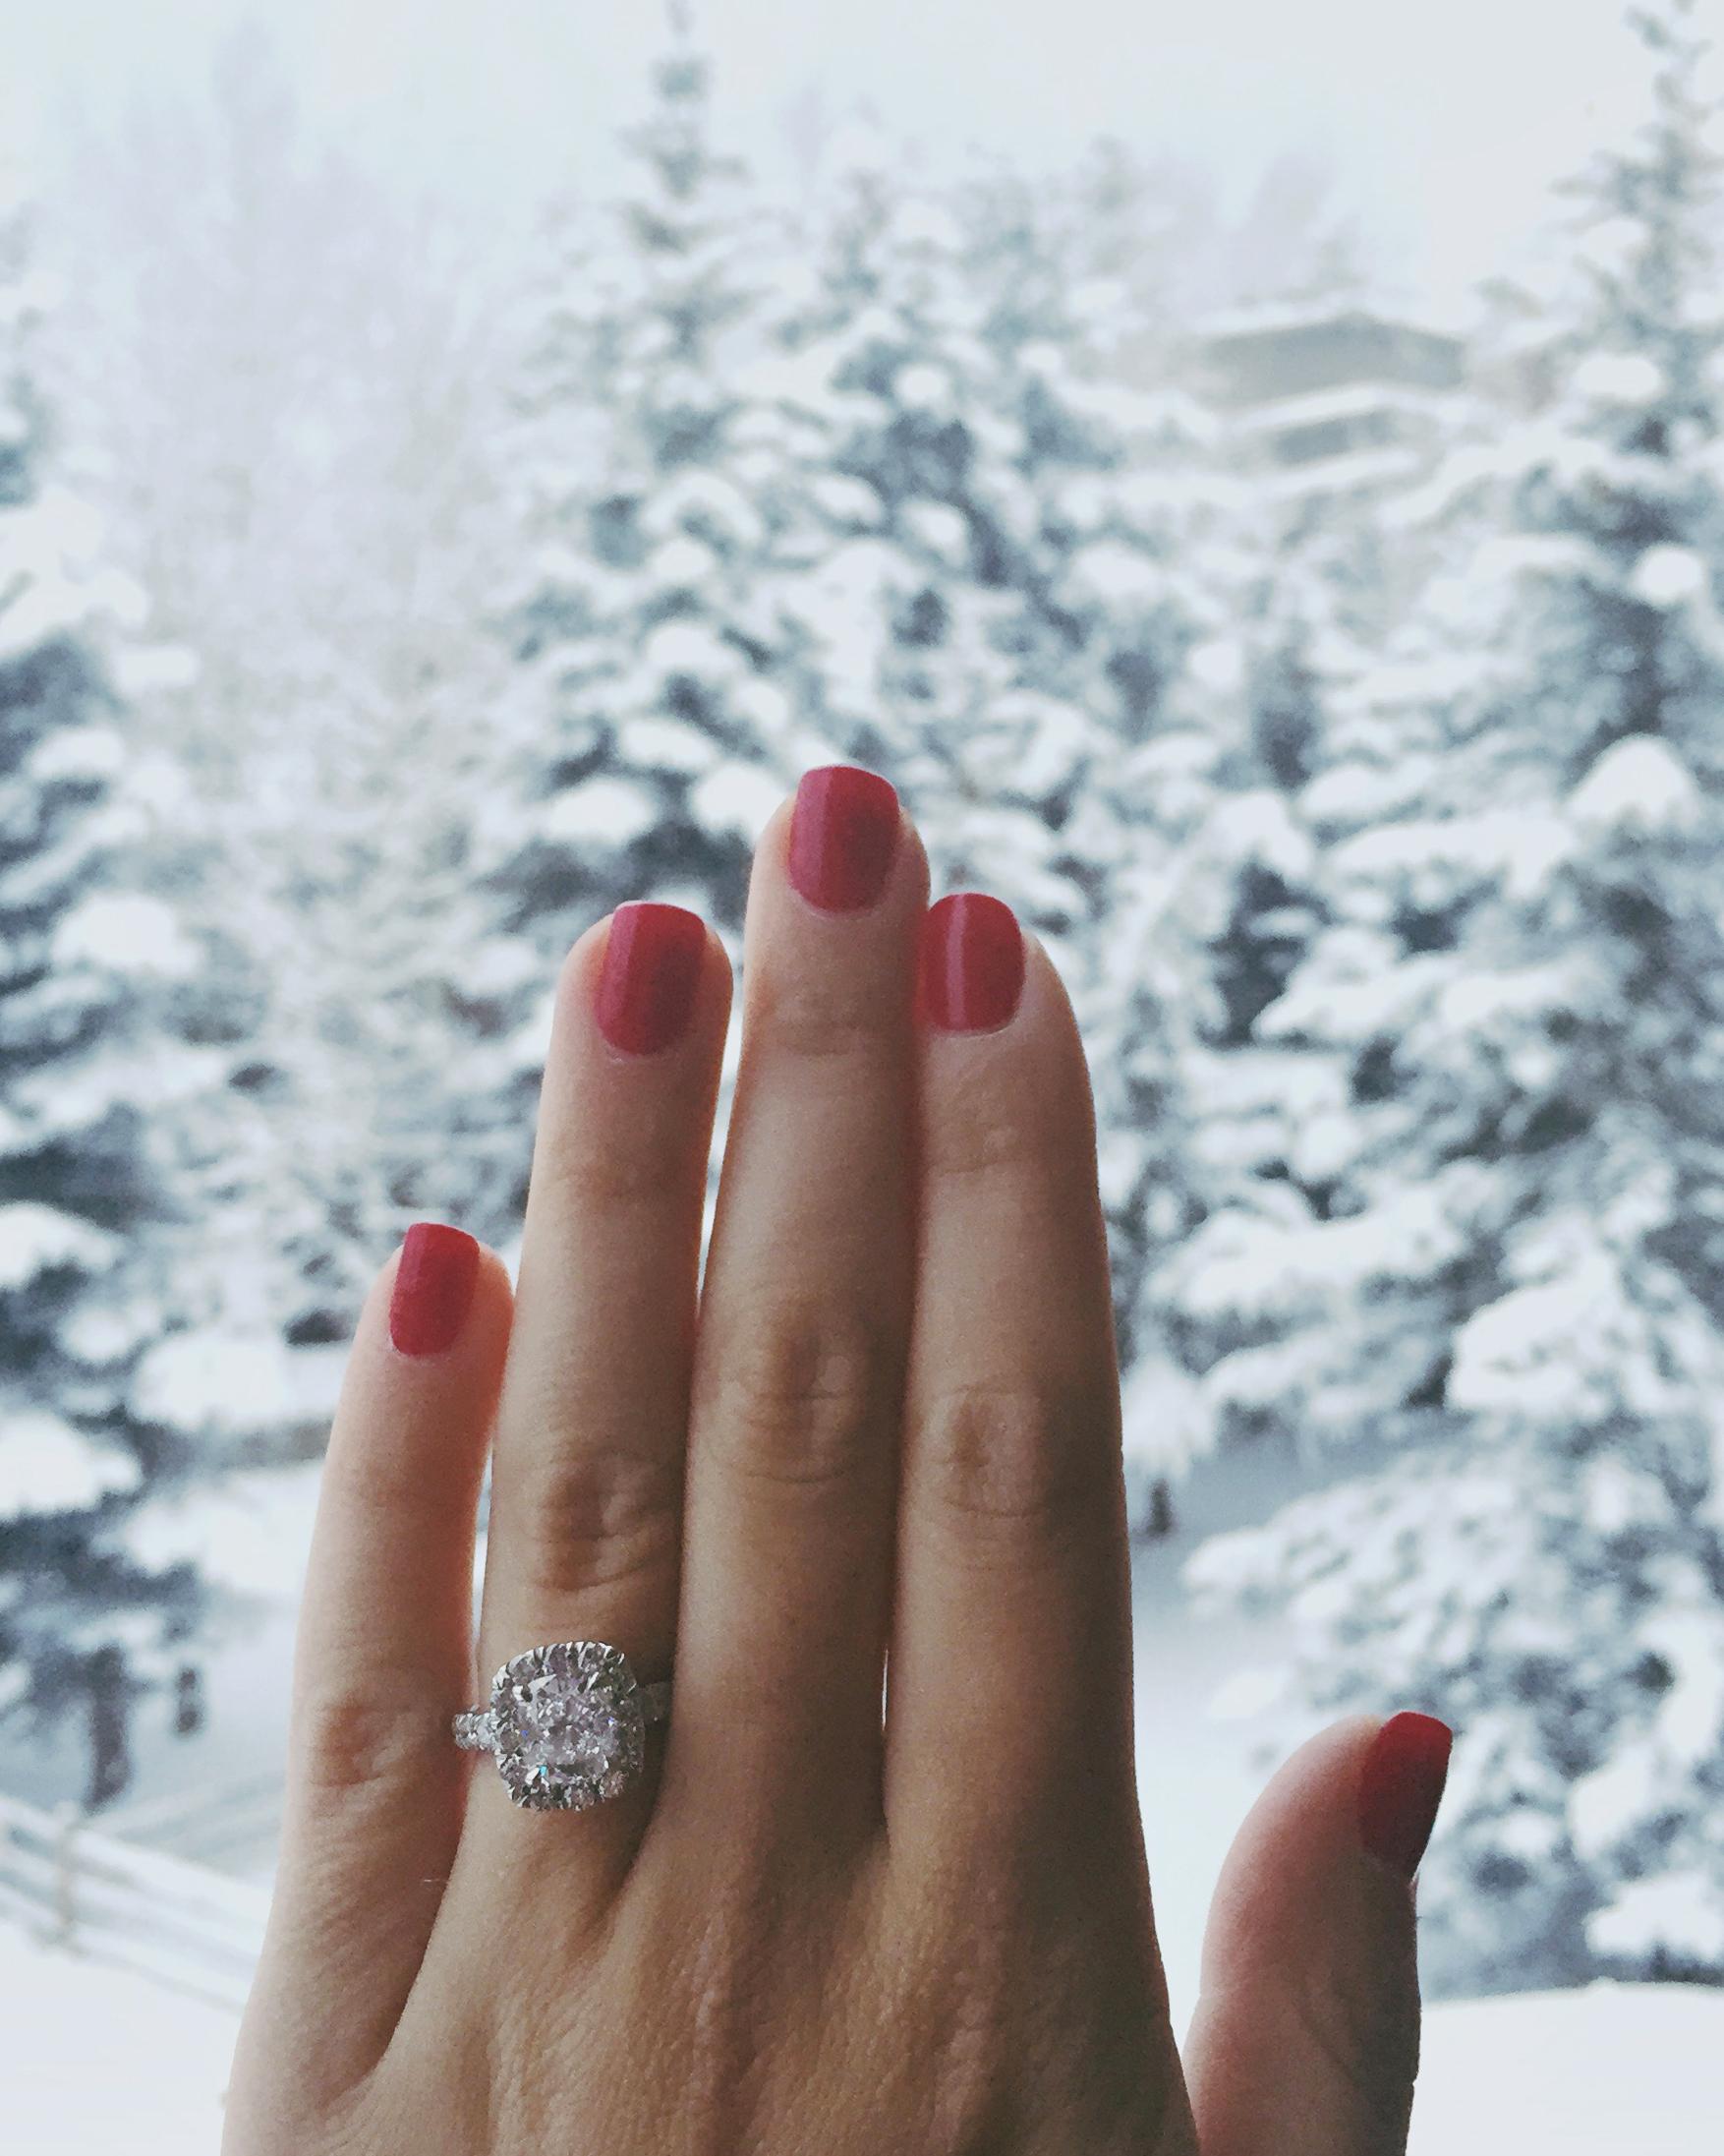 holiday-proposal-aspen-lucinda-matthew-ring-winter-0115.jpg